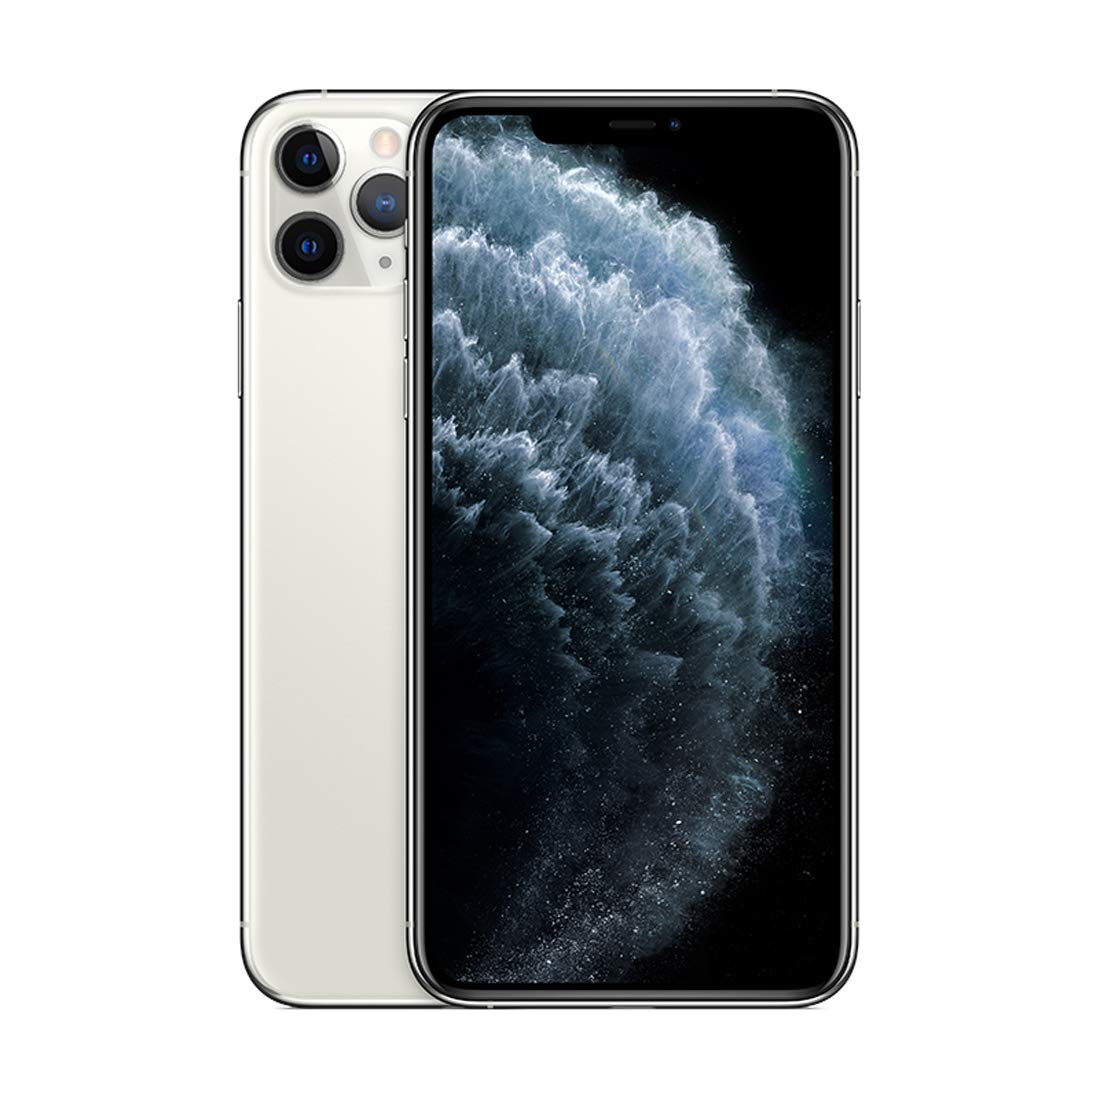 Generic Goophone 11max 512GB Factory Unlocked Cell Phone - International Version (Sliver)